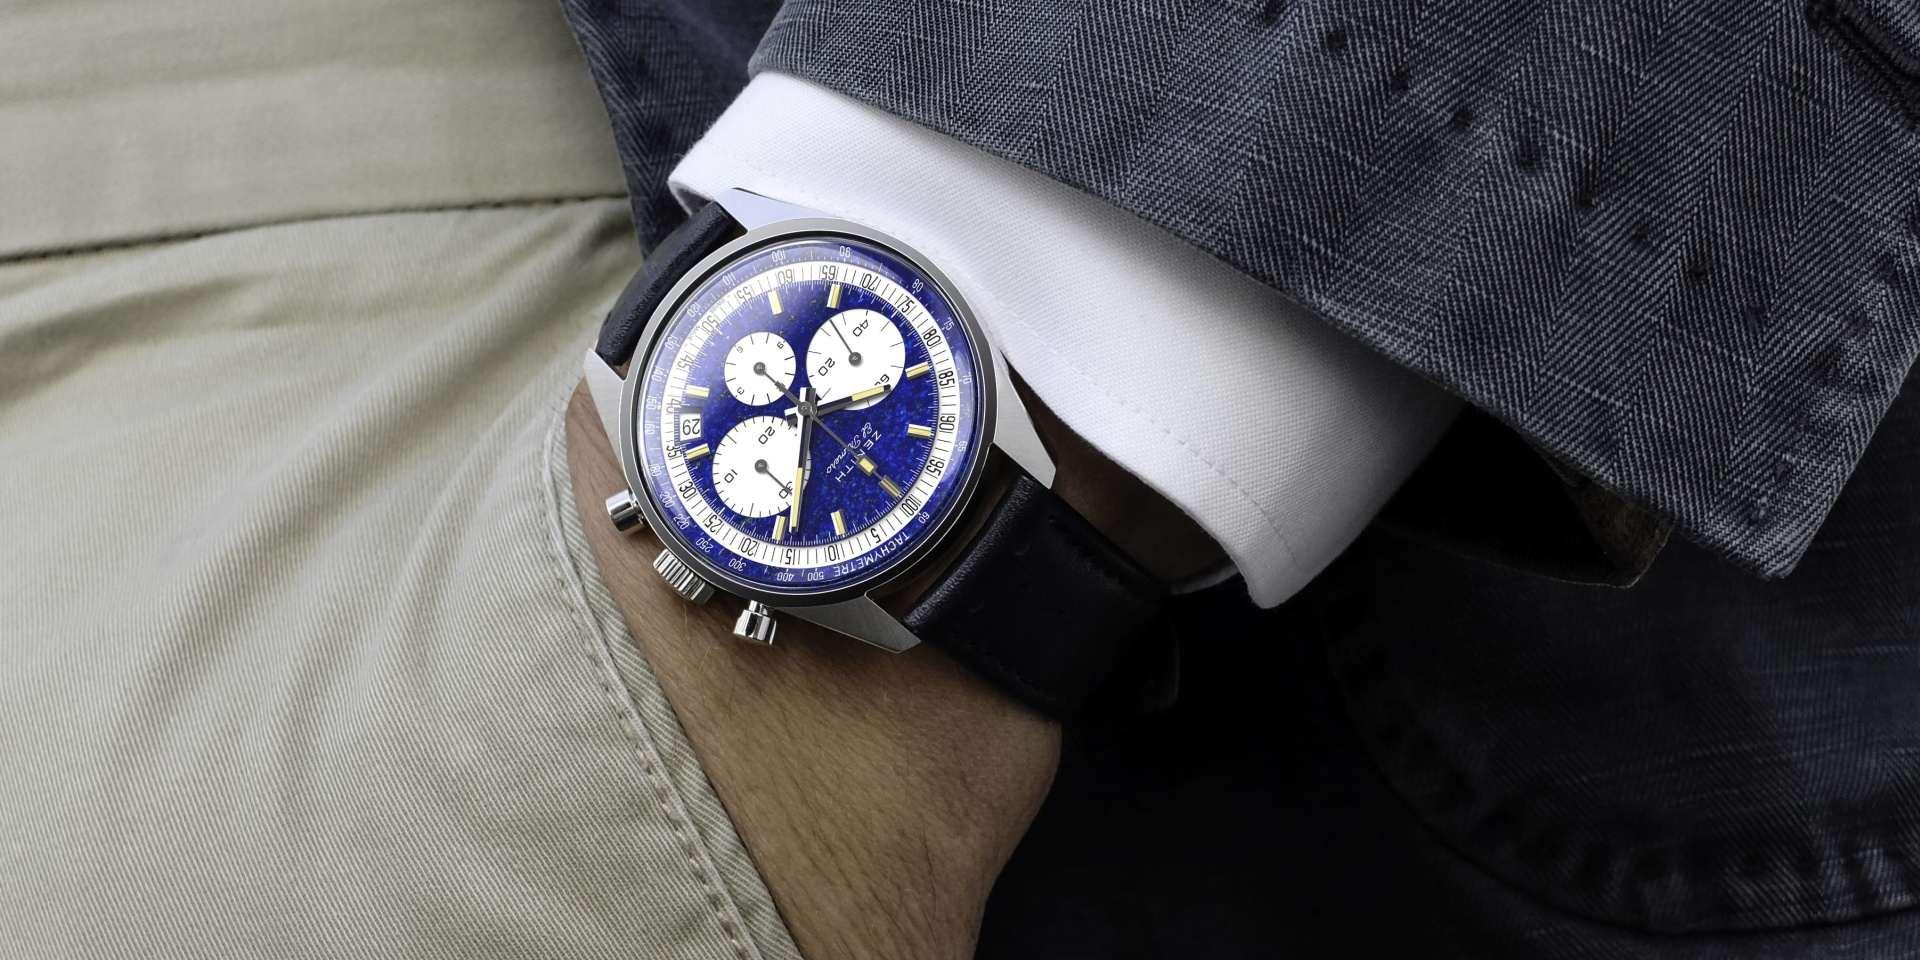 ZENITH 真力時打造獨一無二款的鉑金El Primero計時碼錶A386,拍賣襄助Zoe4Life公益組織